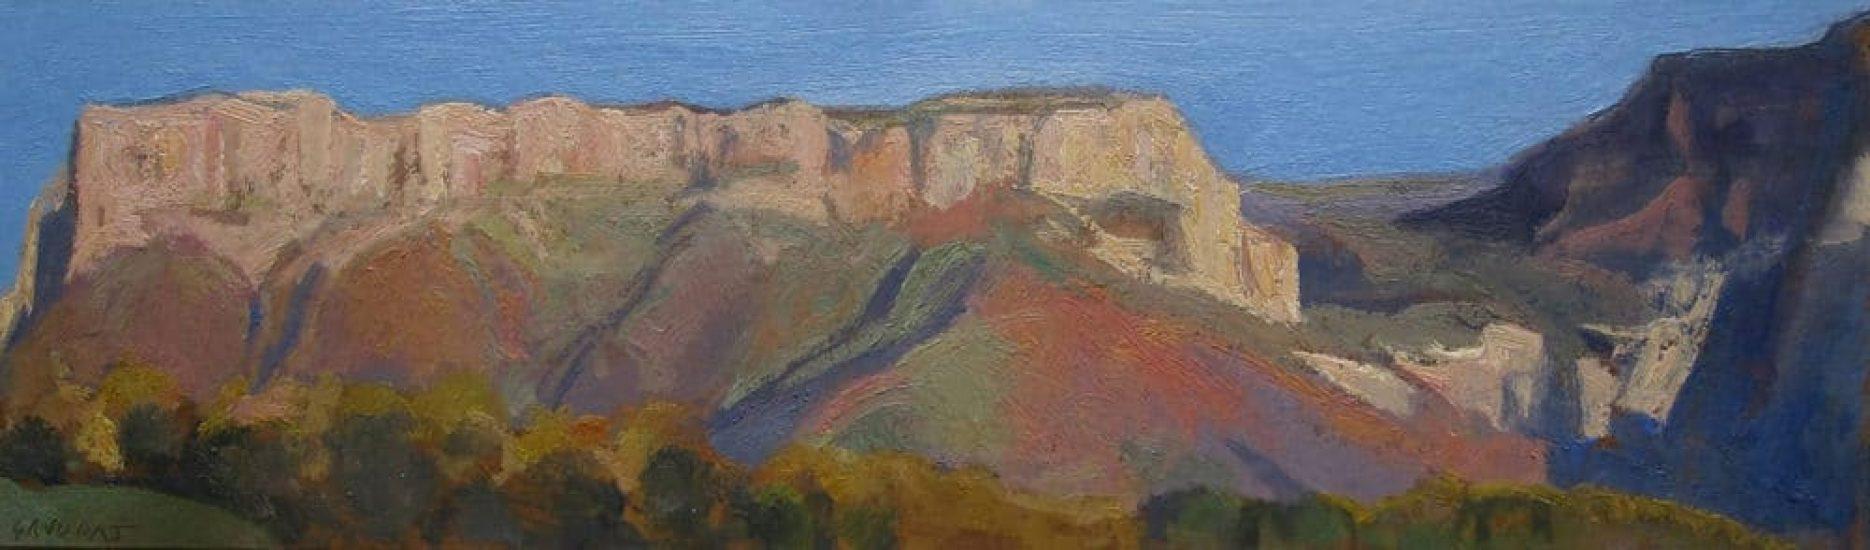 Le Granier, le soir - 15 x 50 cm